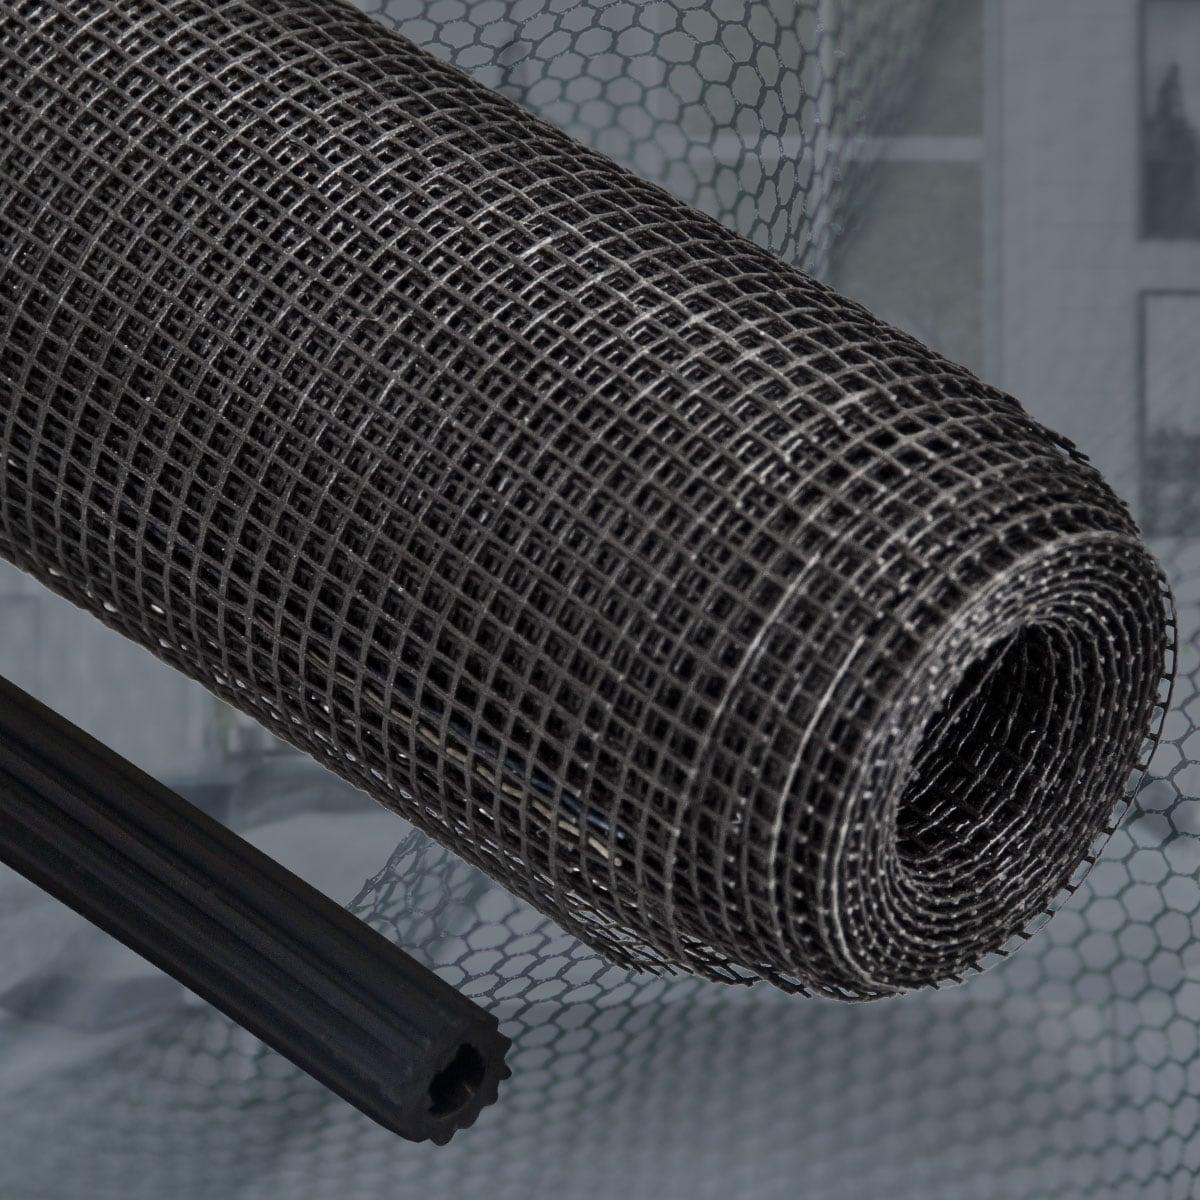 ersatzteile zubeh r. Black Bedroom Furniture Sets. Home Design Ideas